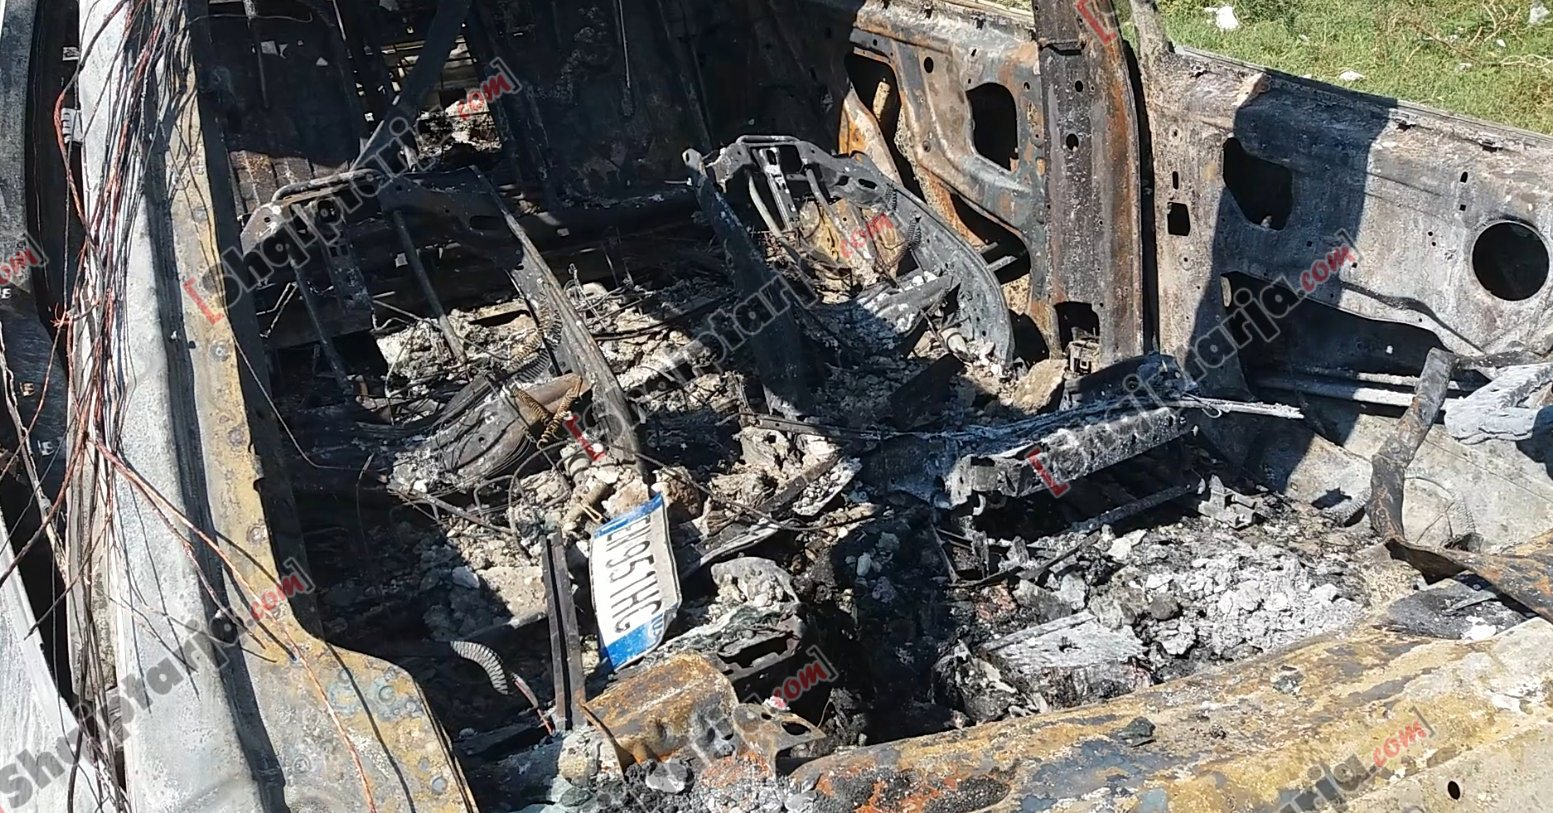 makina djegur fier llanaj atentati vlore